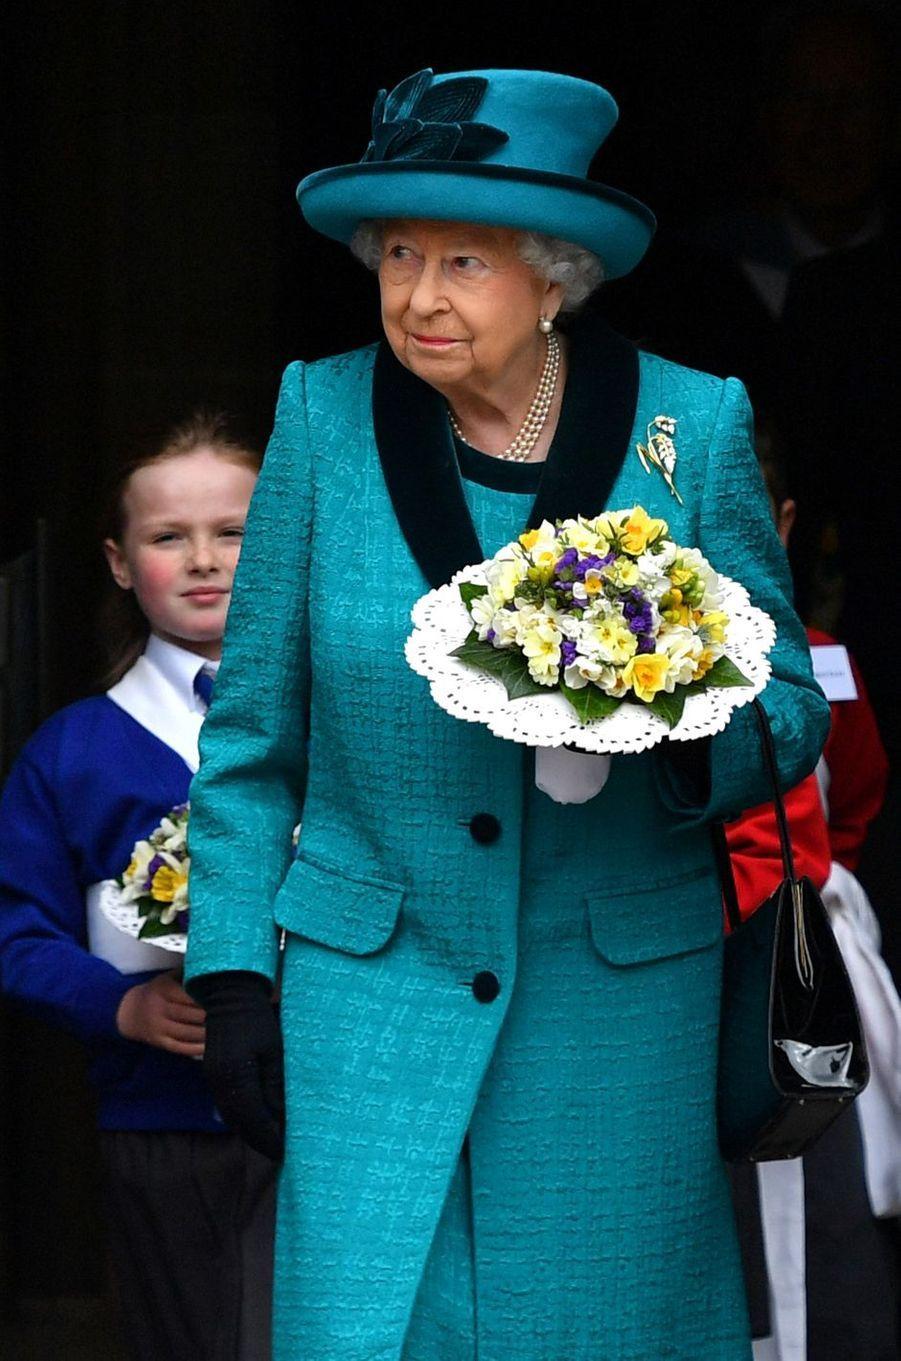 La reine Elizabeth II à Leicester, le 13 avril 2017